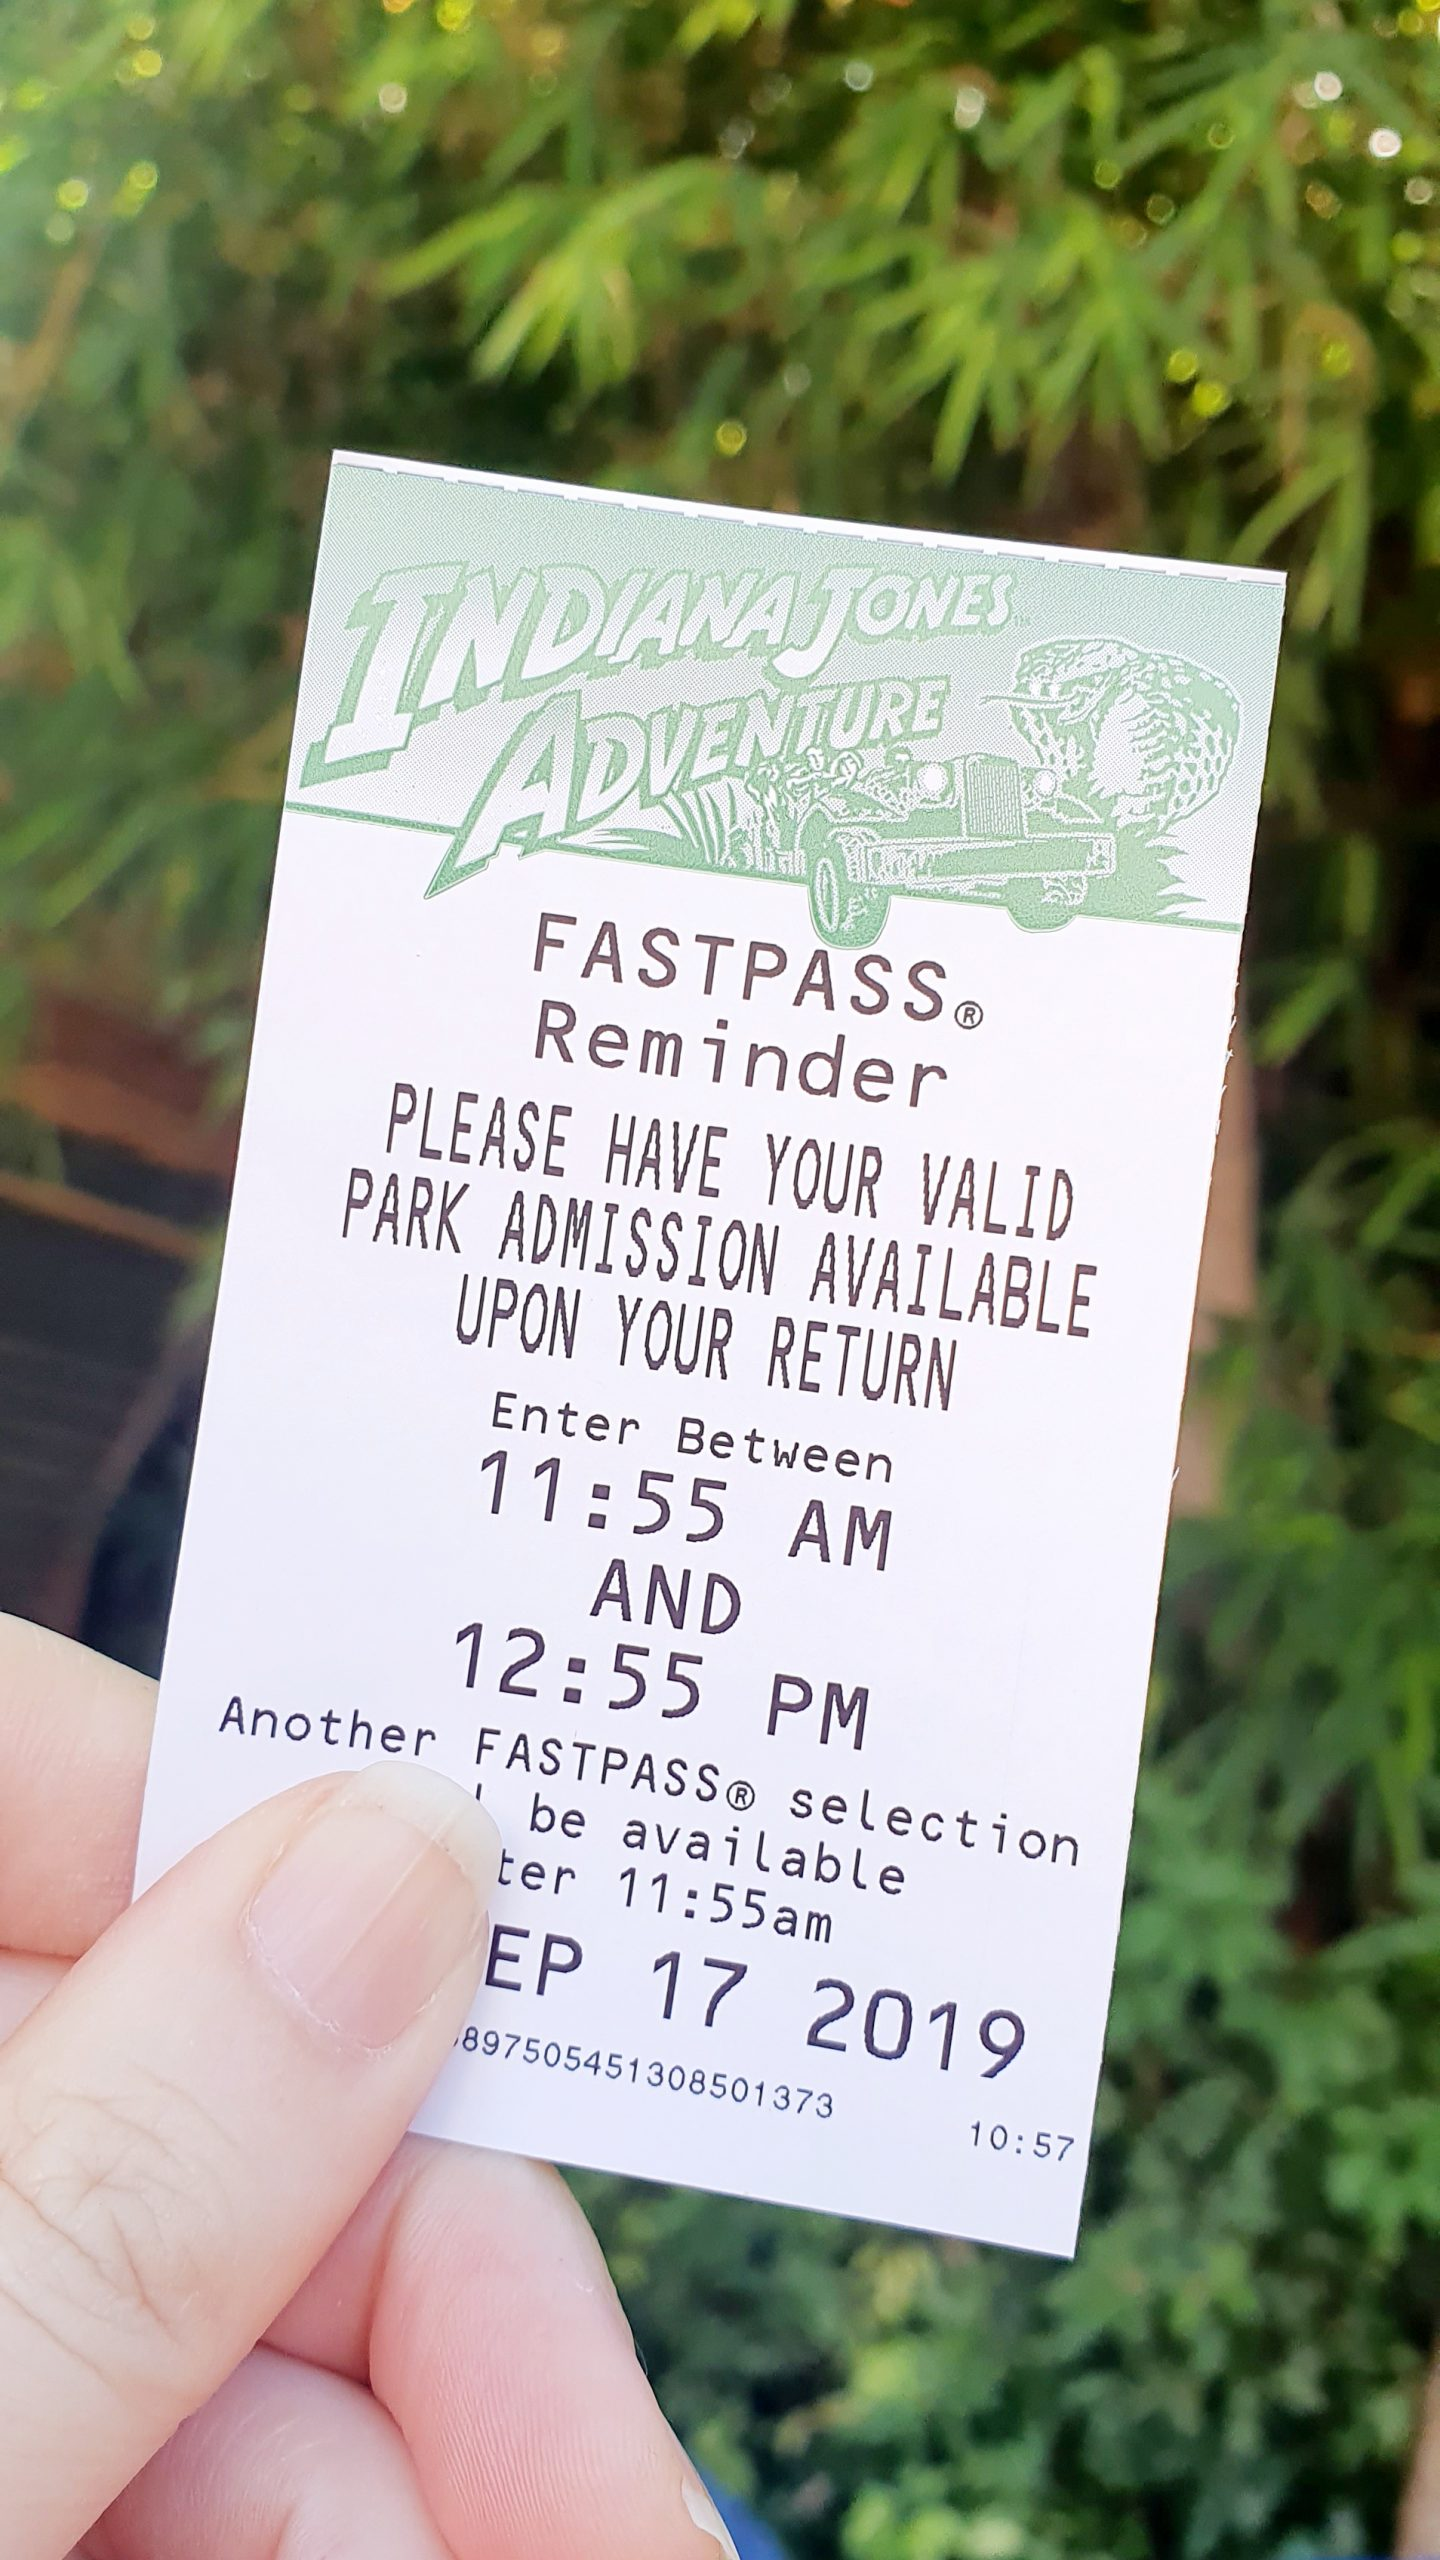 Disneyland Adventureland Indiana Jones Adventure